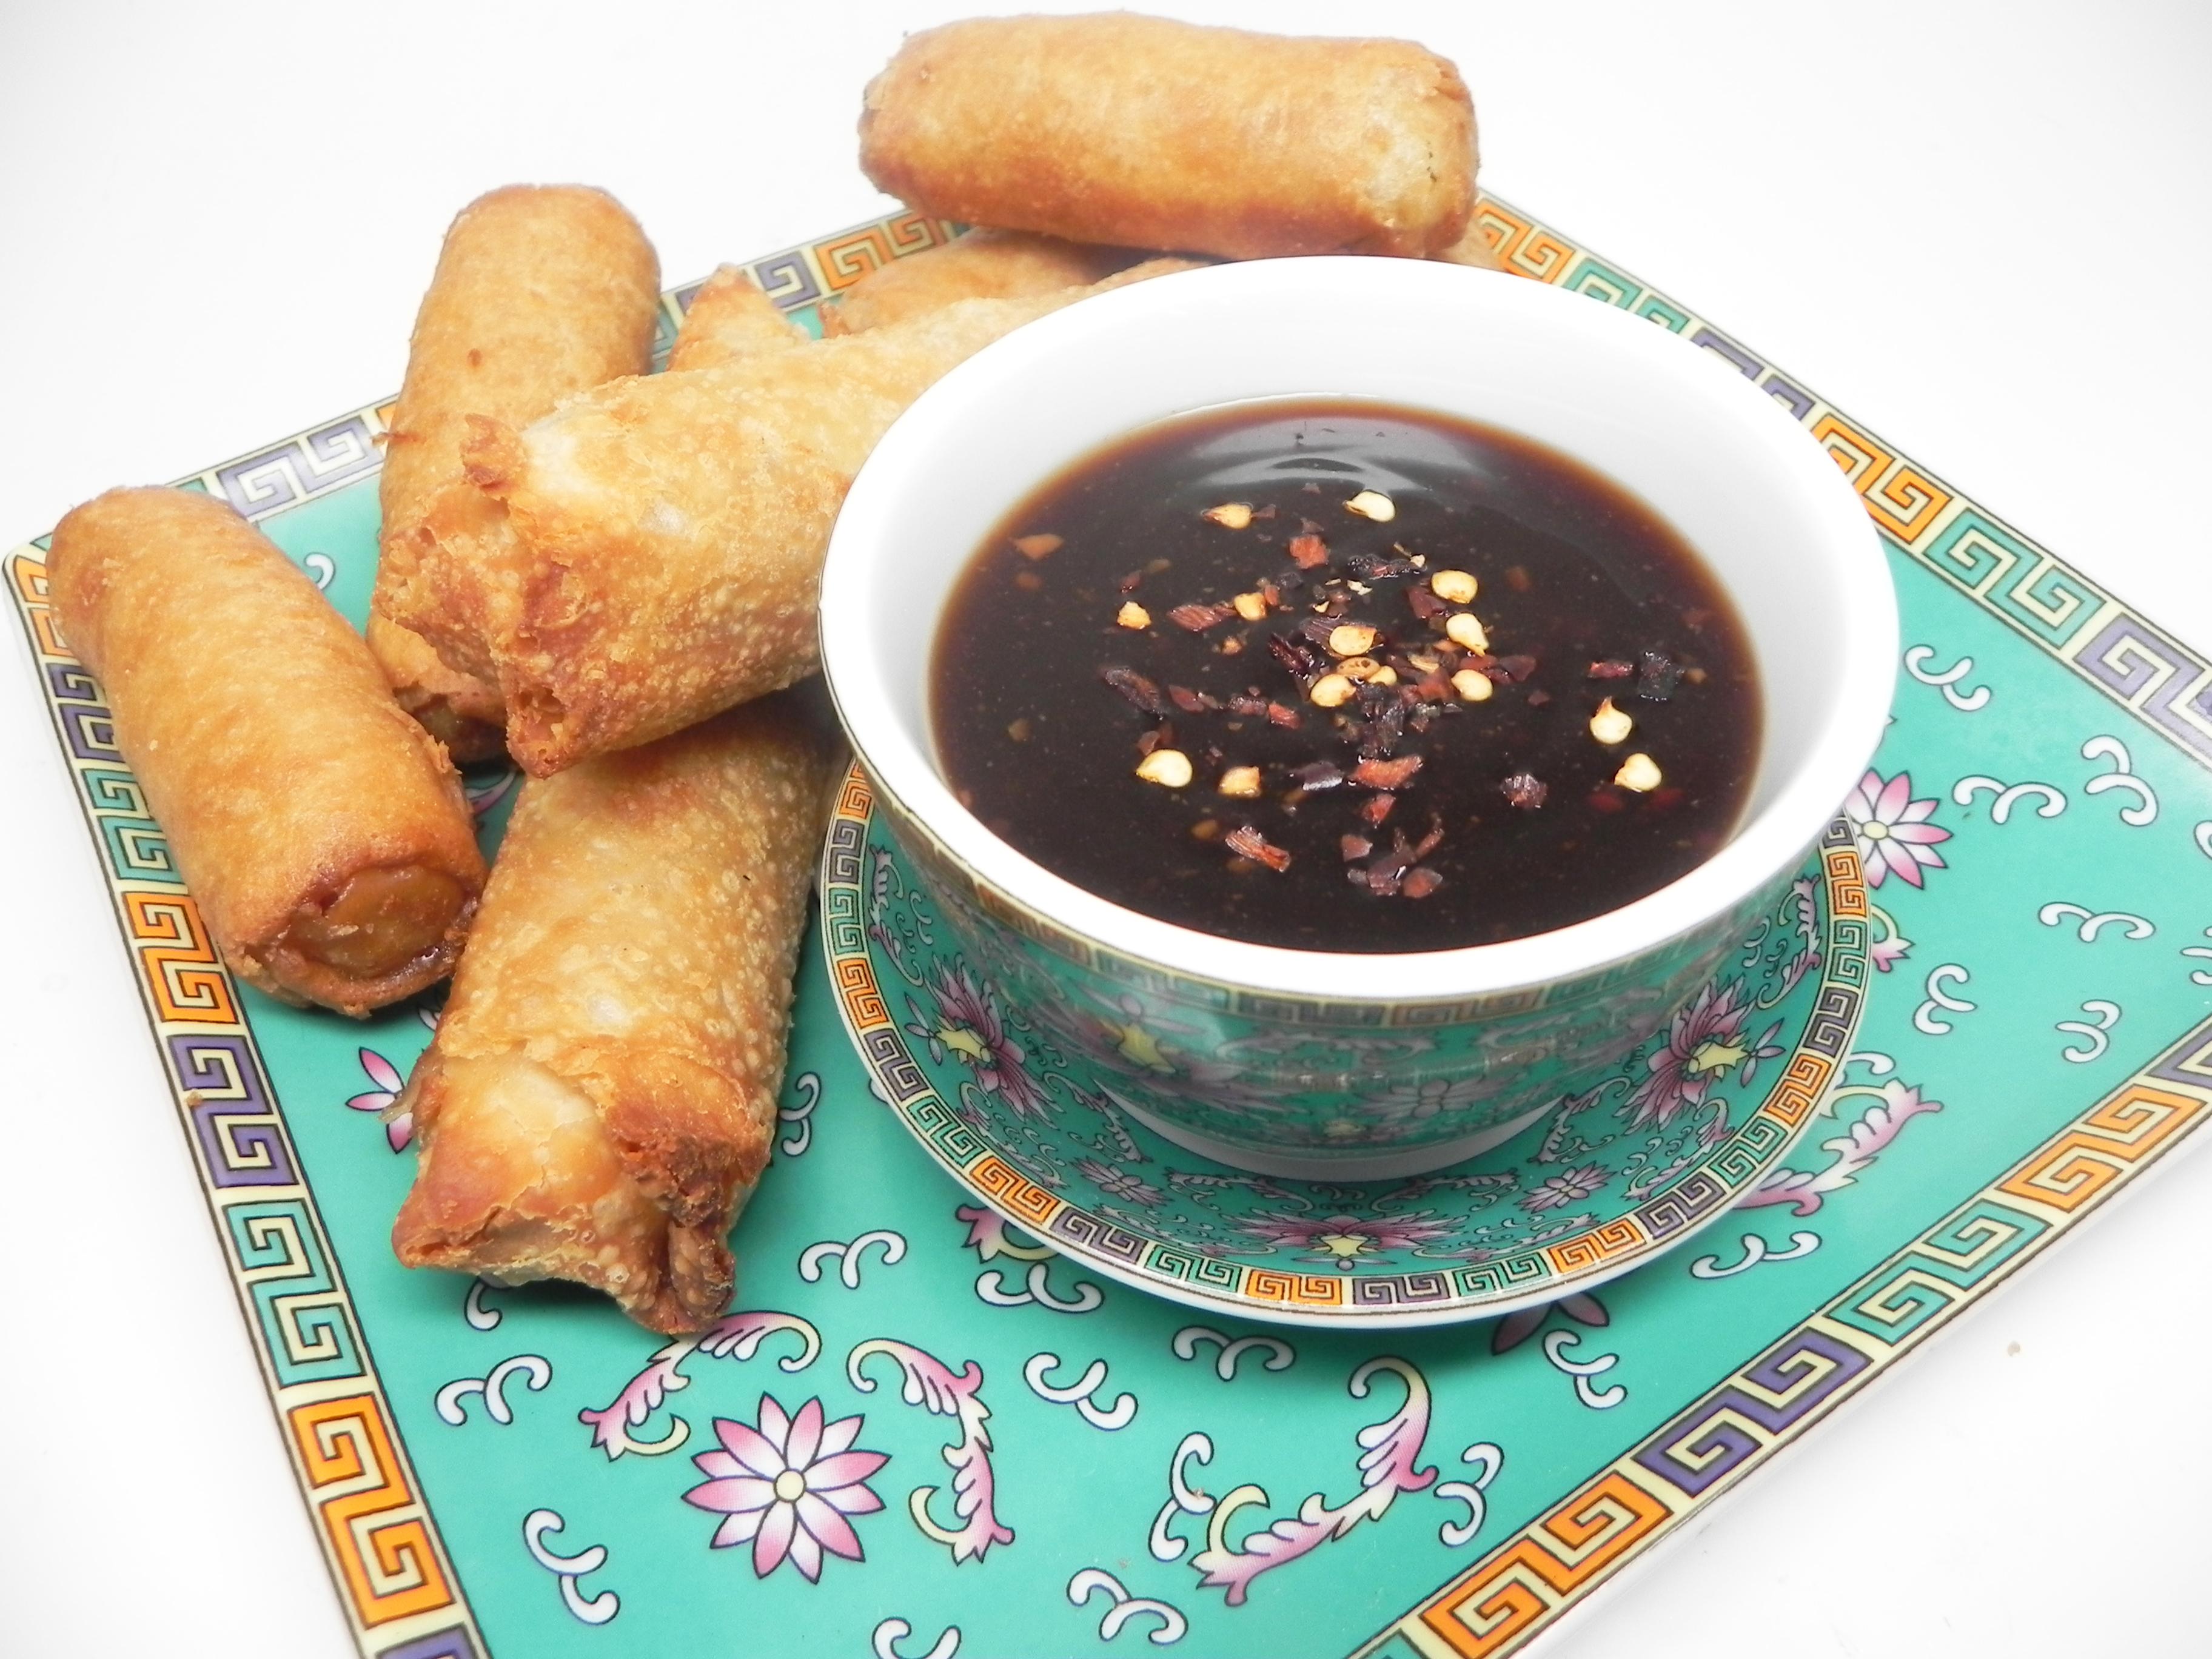 Erin's Easy Stir-Fry Sauce